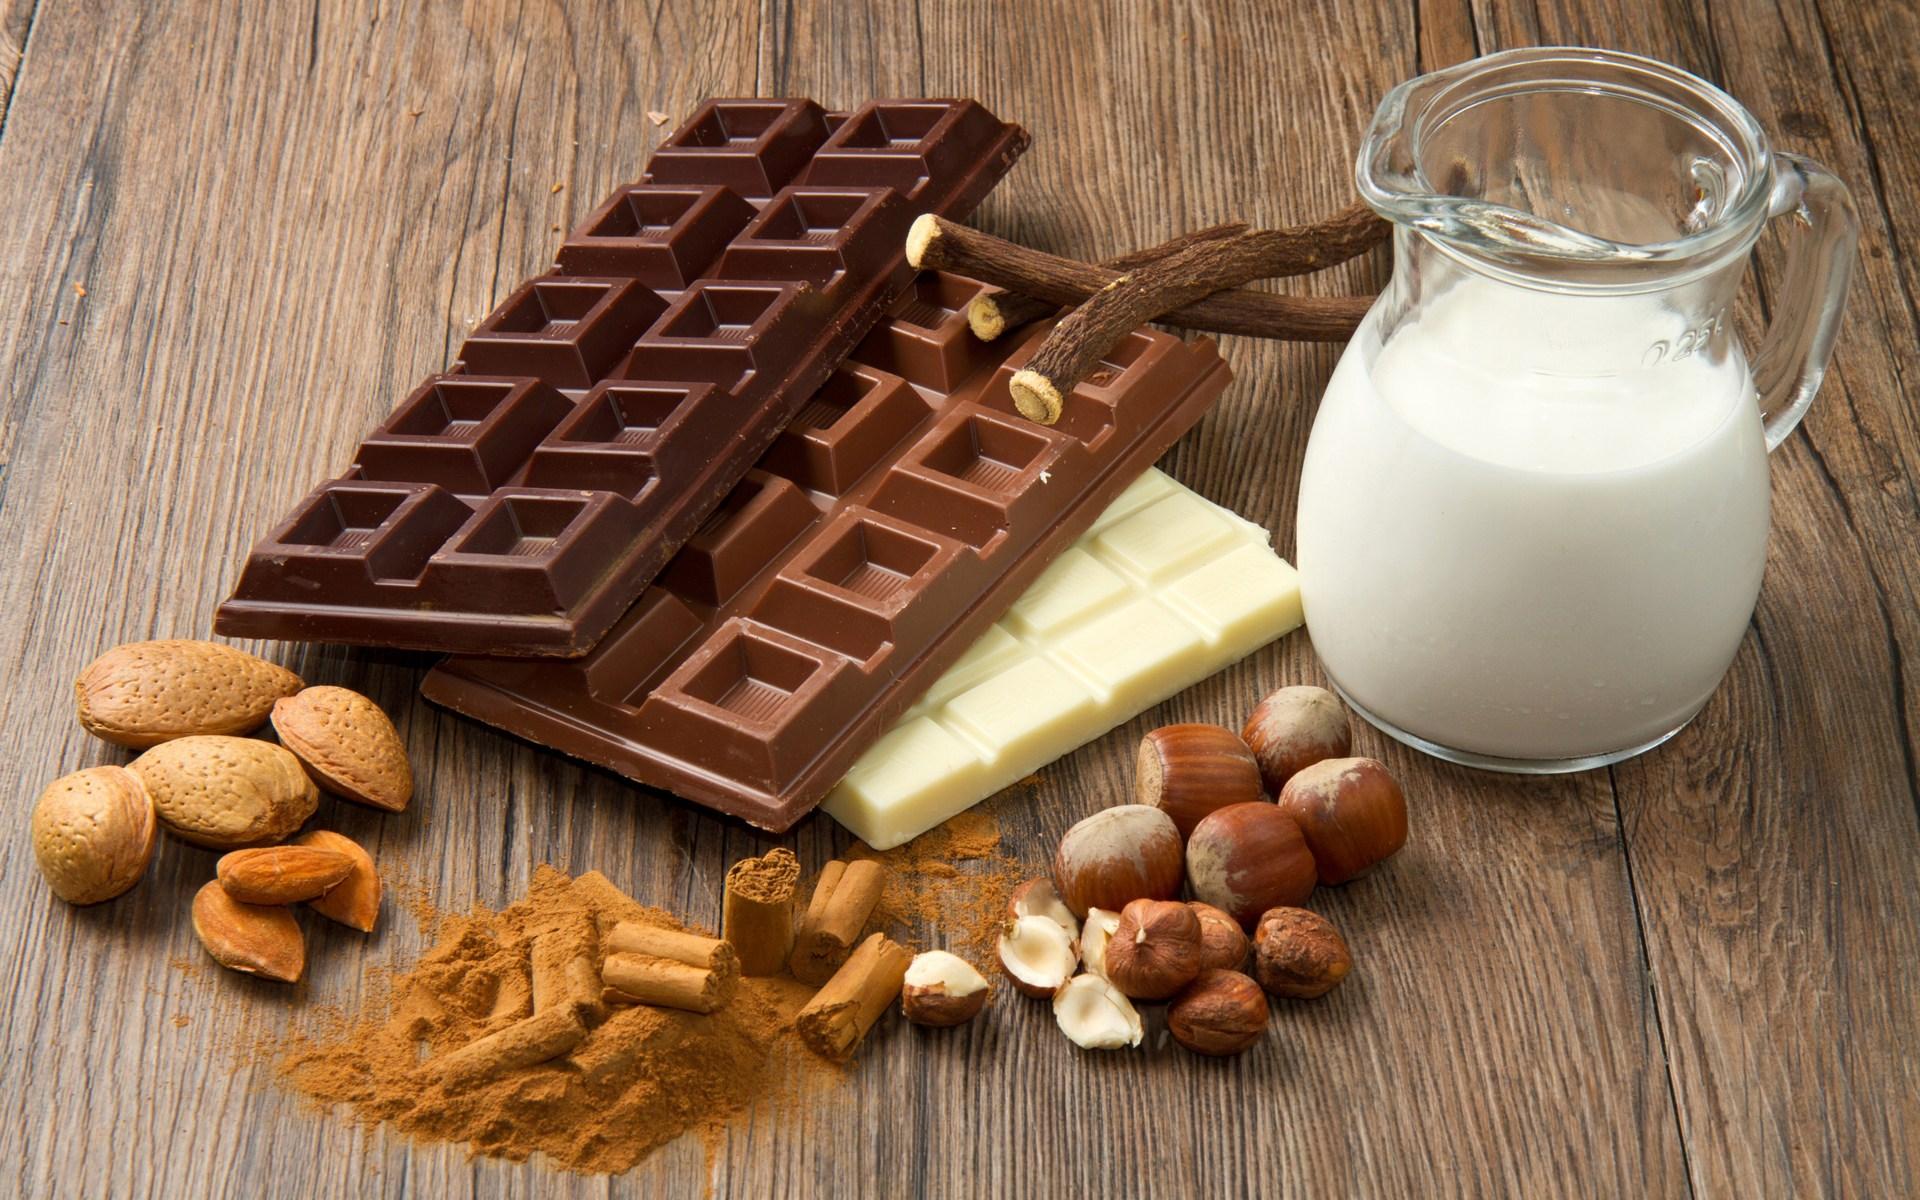 hinh nen chocolate 14